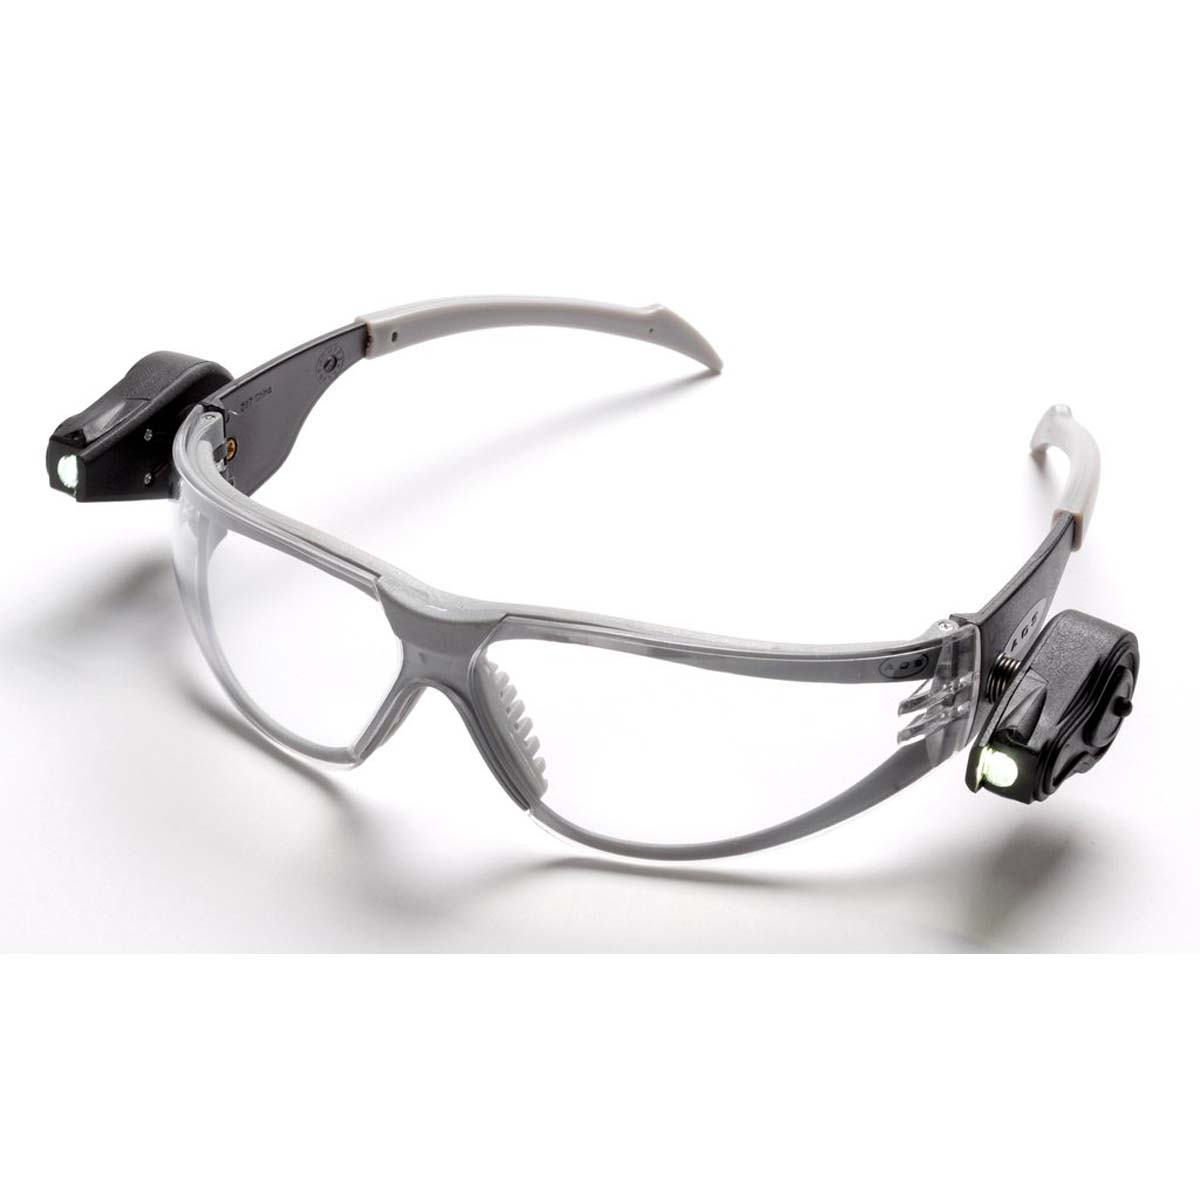 "3Mâ""¢ Light Visionâ""¢ Protective Eyewear"